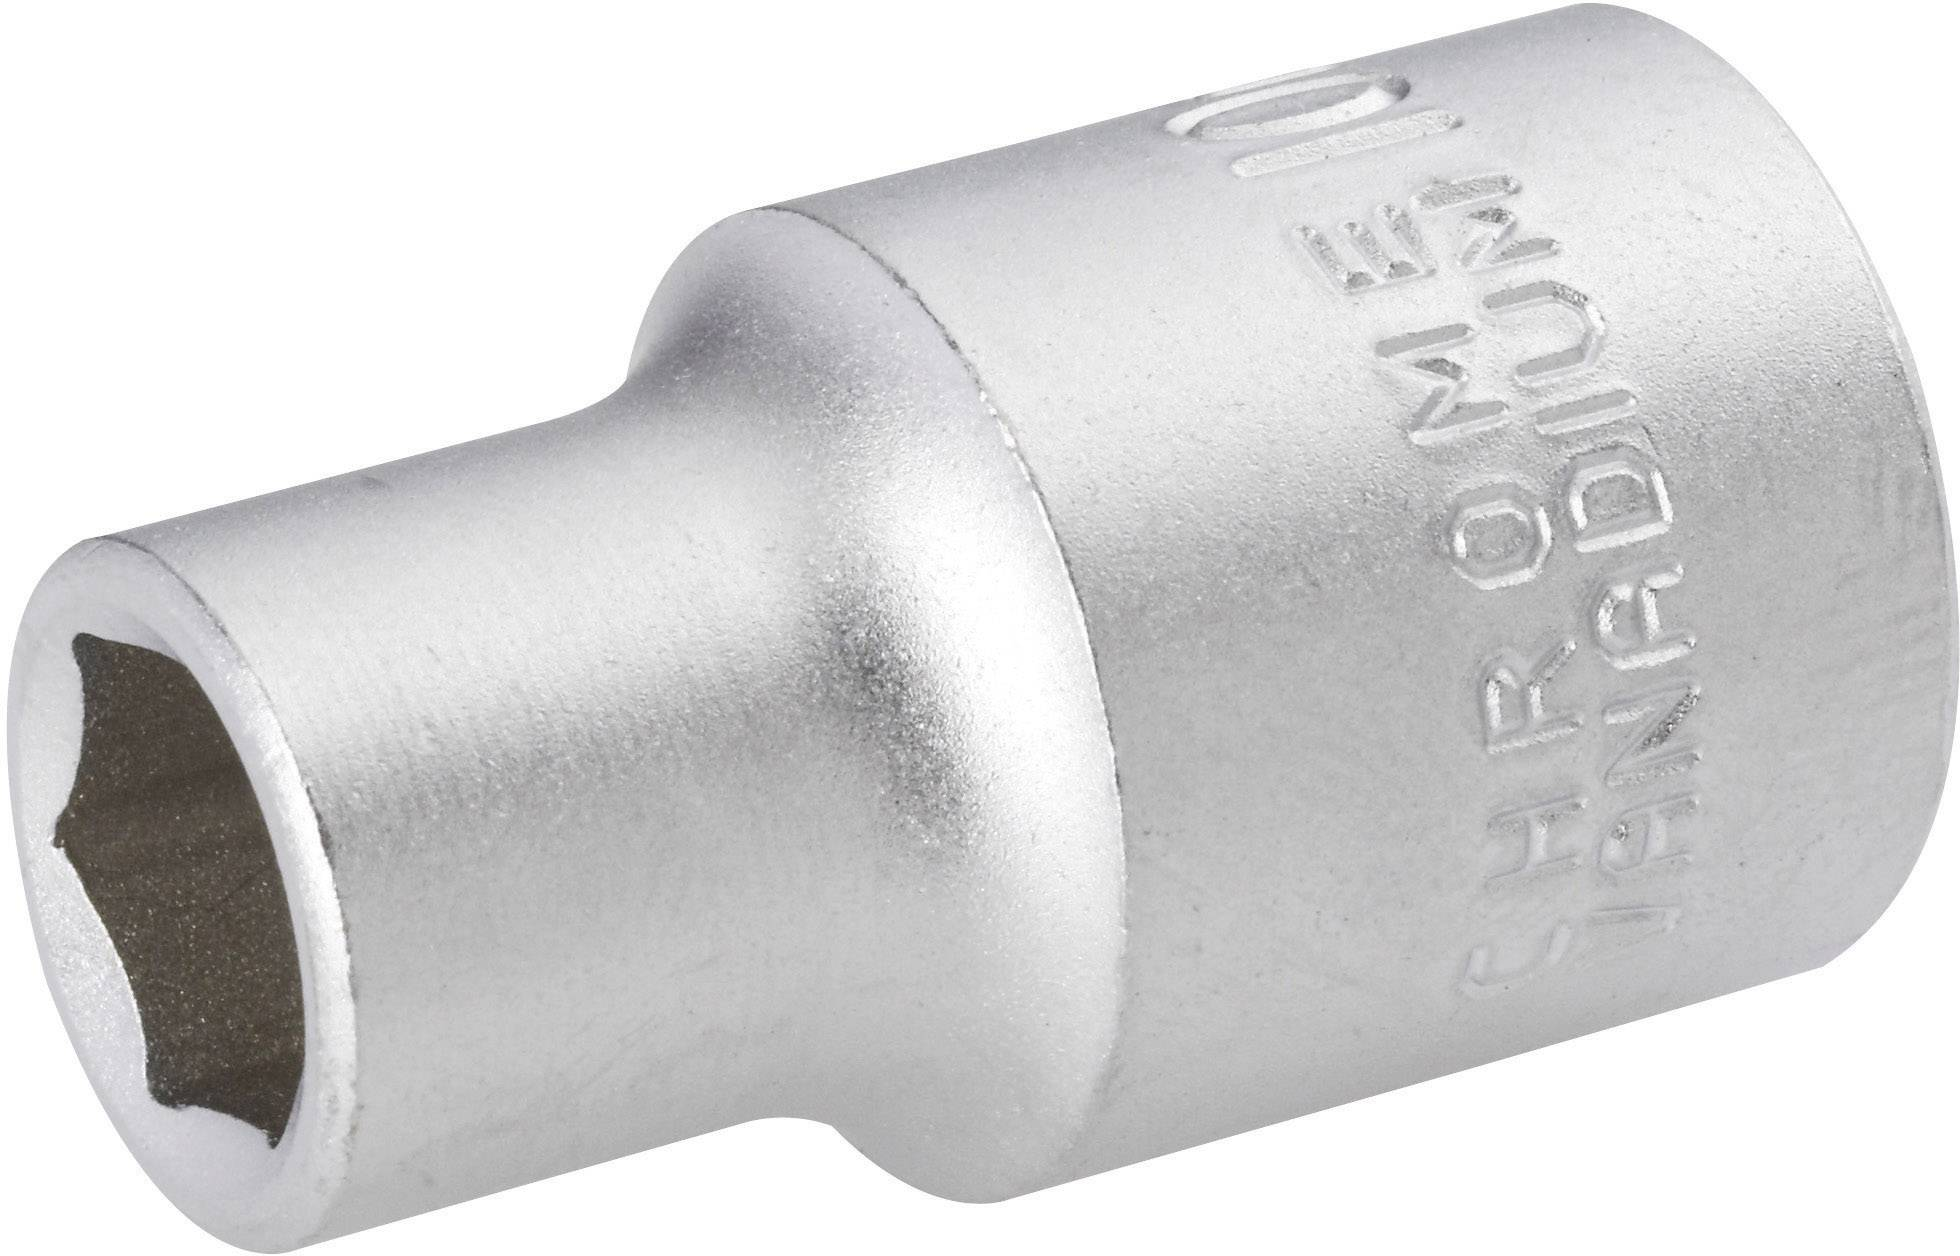 "Nadstavec na račňu TOOLCRAFT 820778, 1/2"" (12.5 mm), 24 mm"